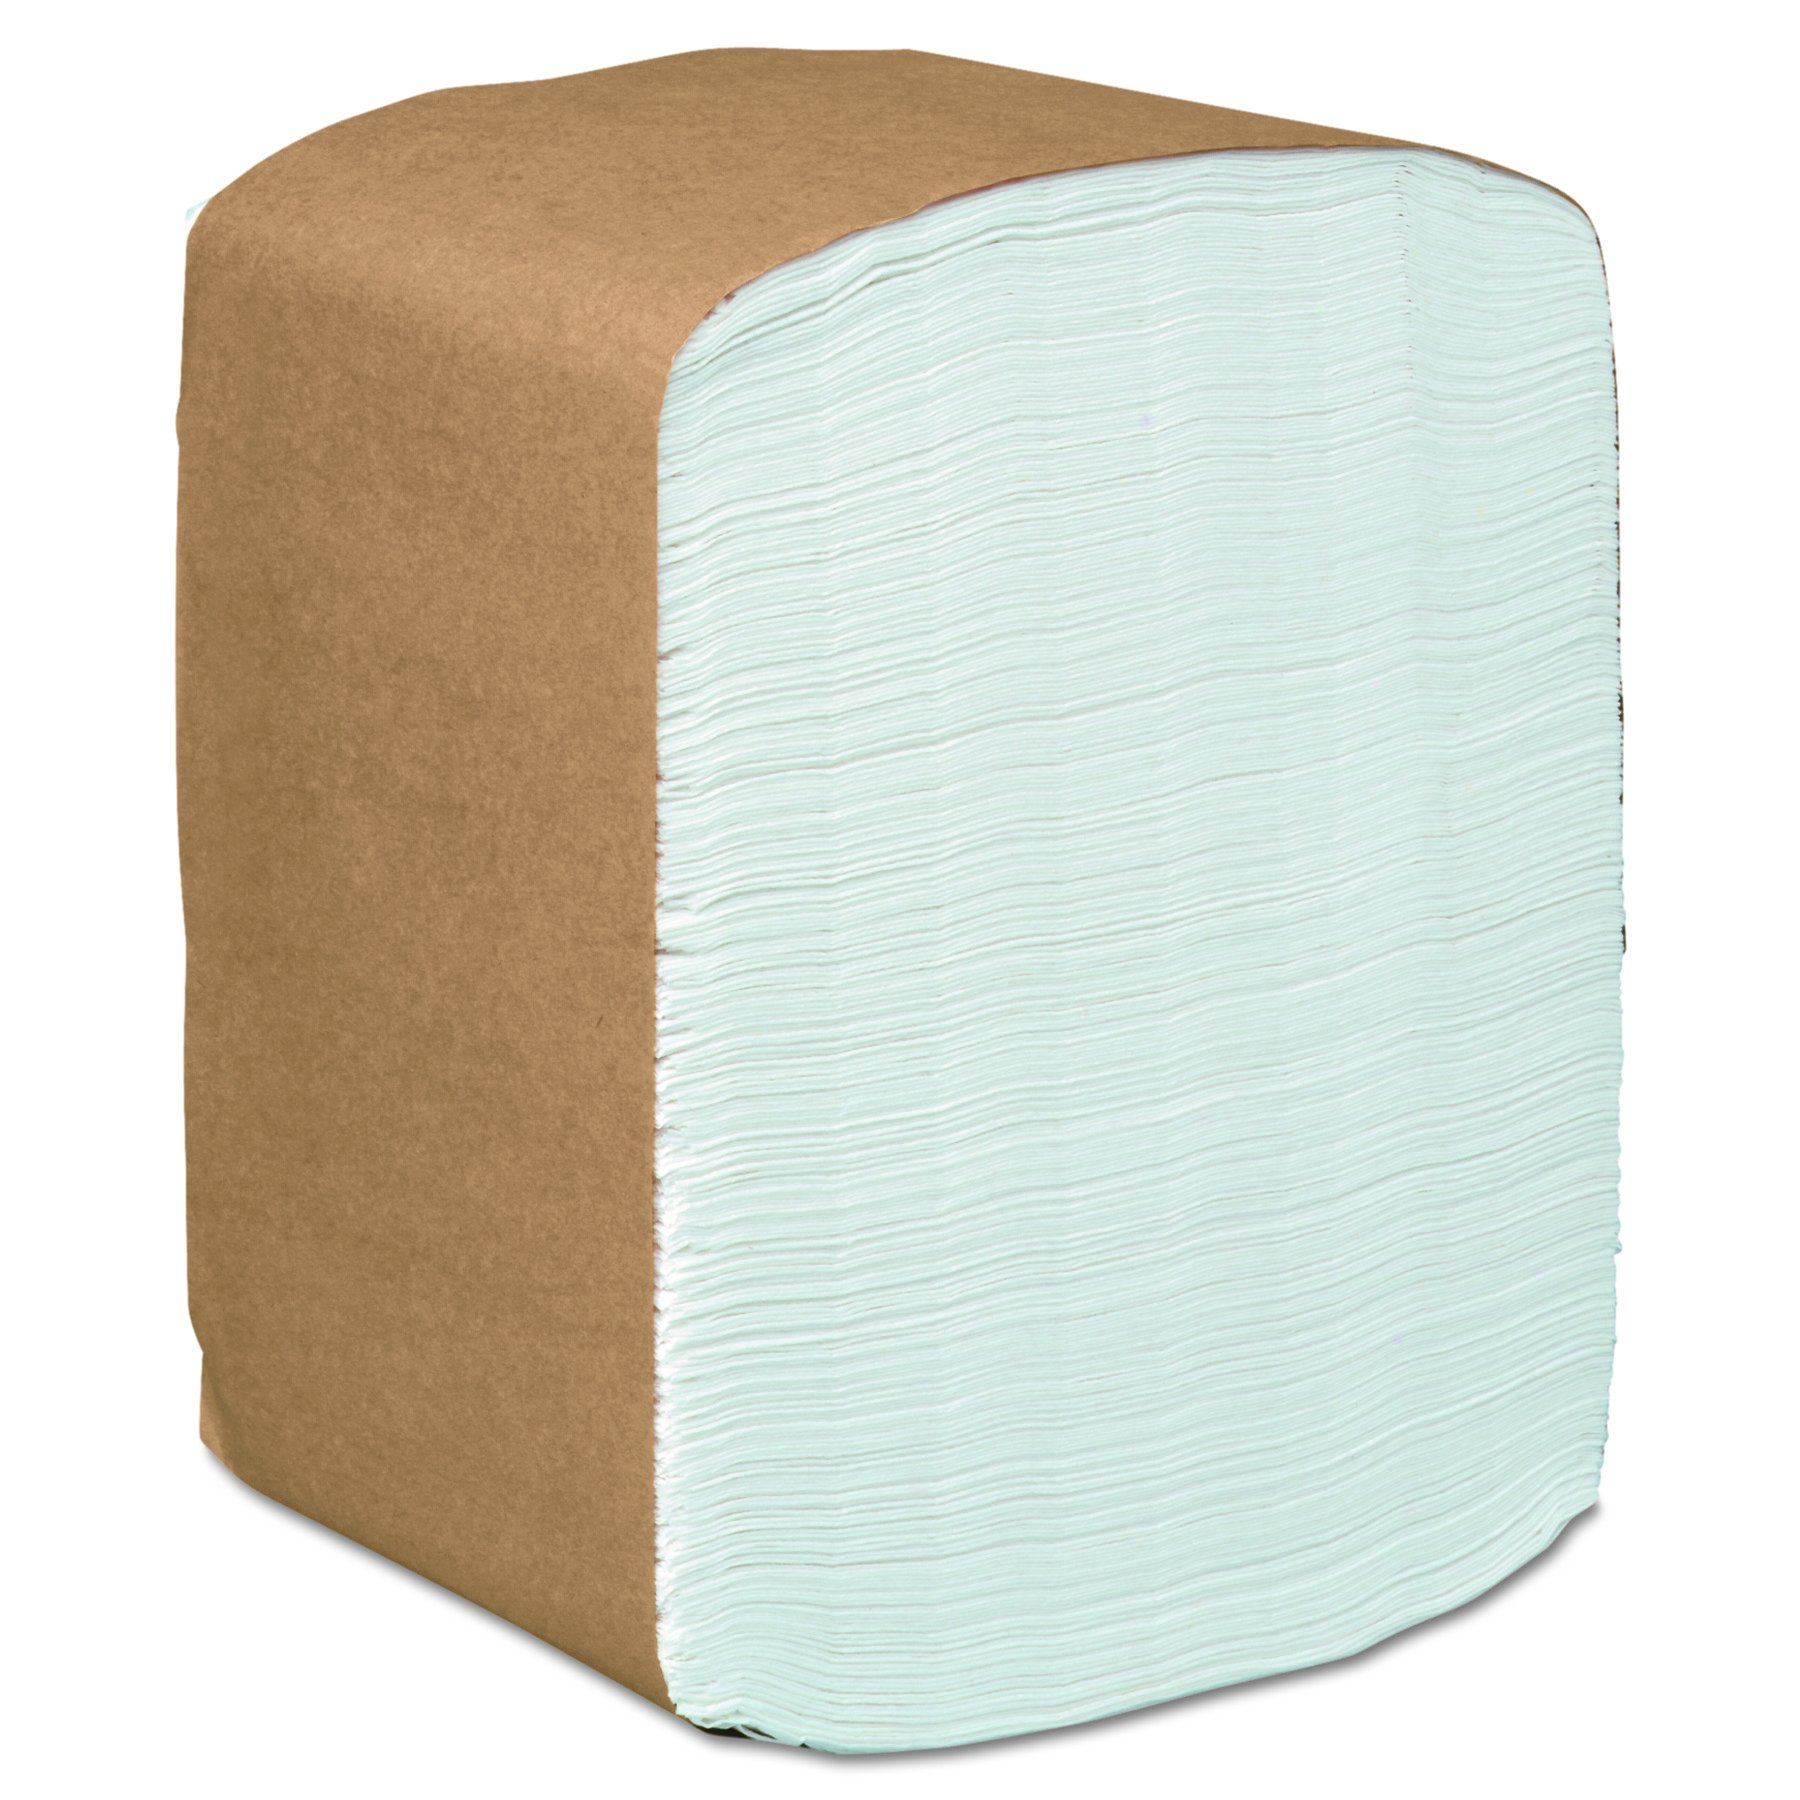 SCOTT 98730 White 12-Inch by 17-Inch Full Fold Dispenser Napkins (6,000 per Case)